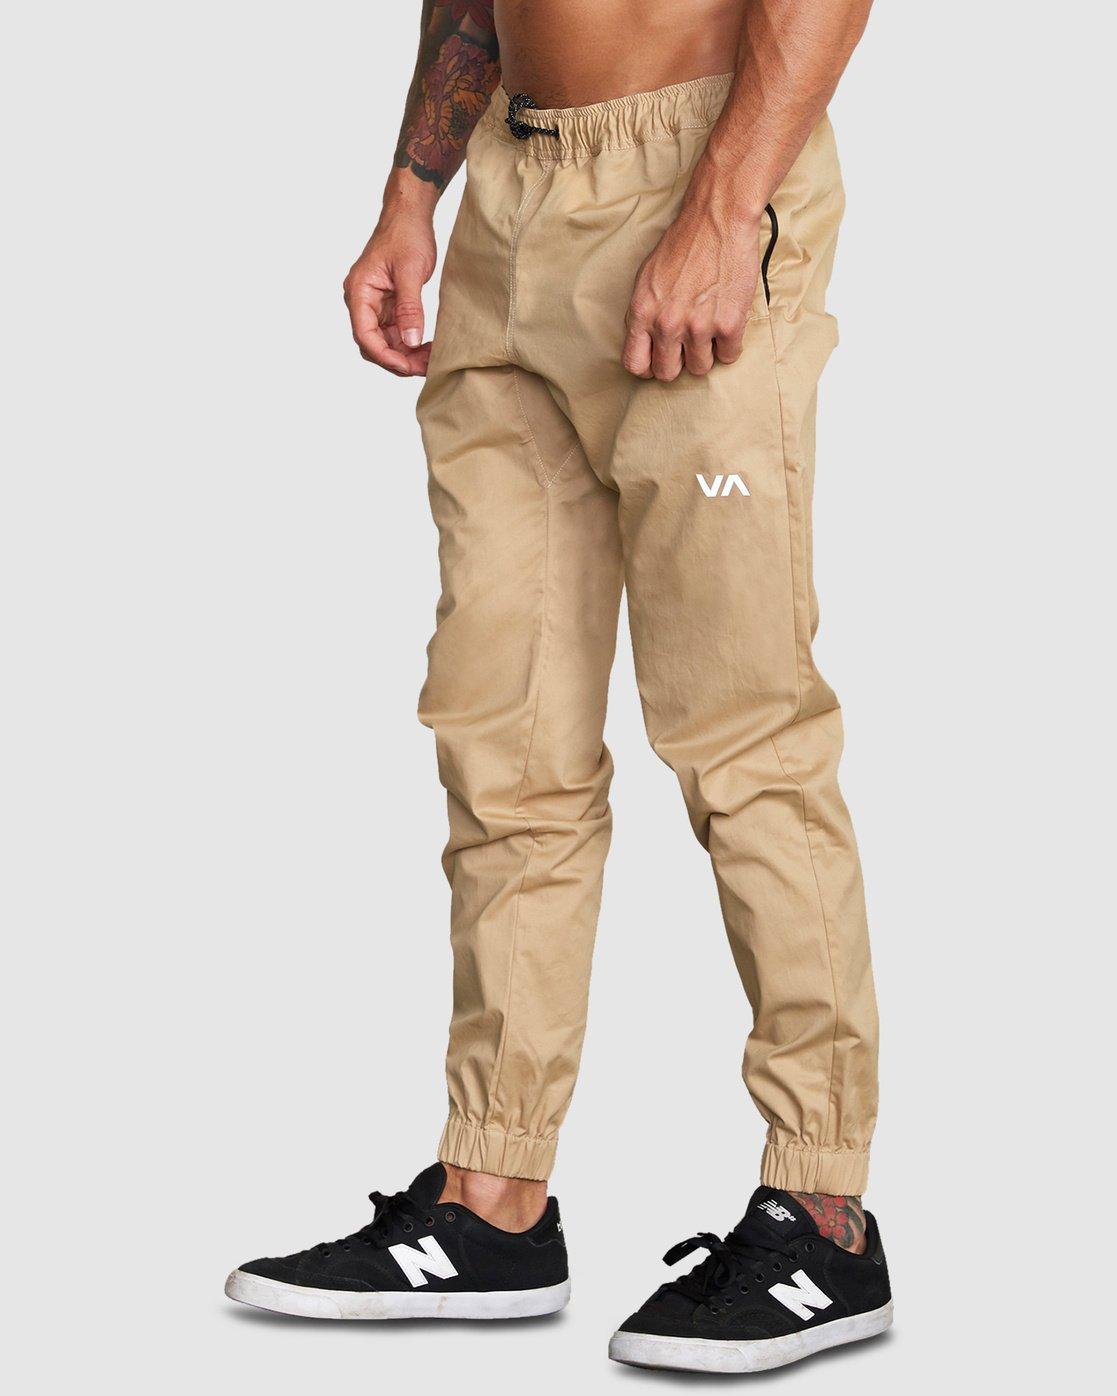 0 SPECTRUM CUFFED PANTS Yellow R307276 RVCA